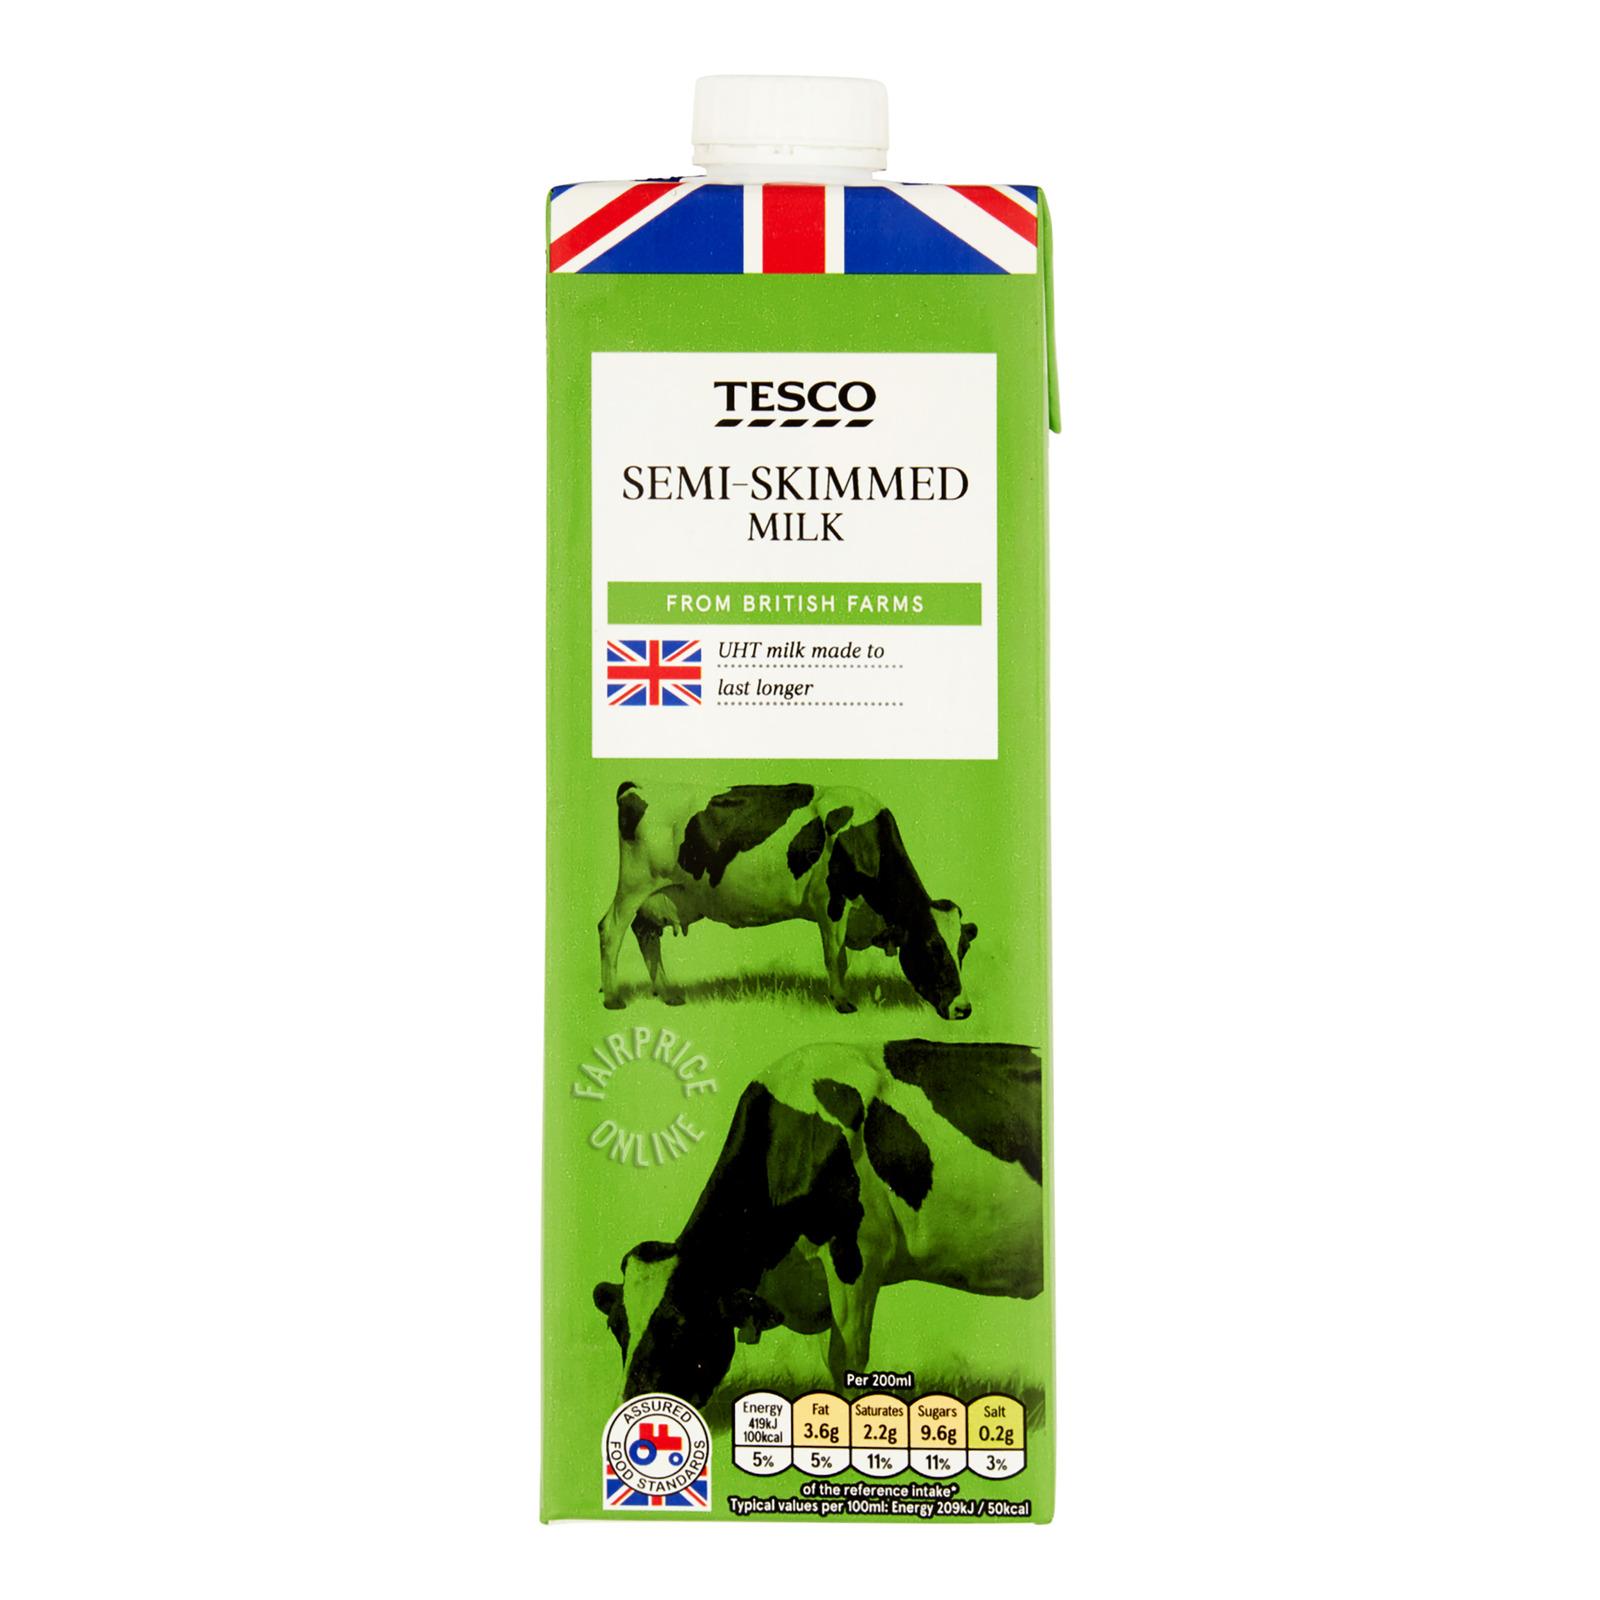 Tesco UHT Milk - Semi-Skimmed